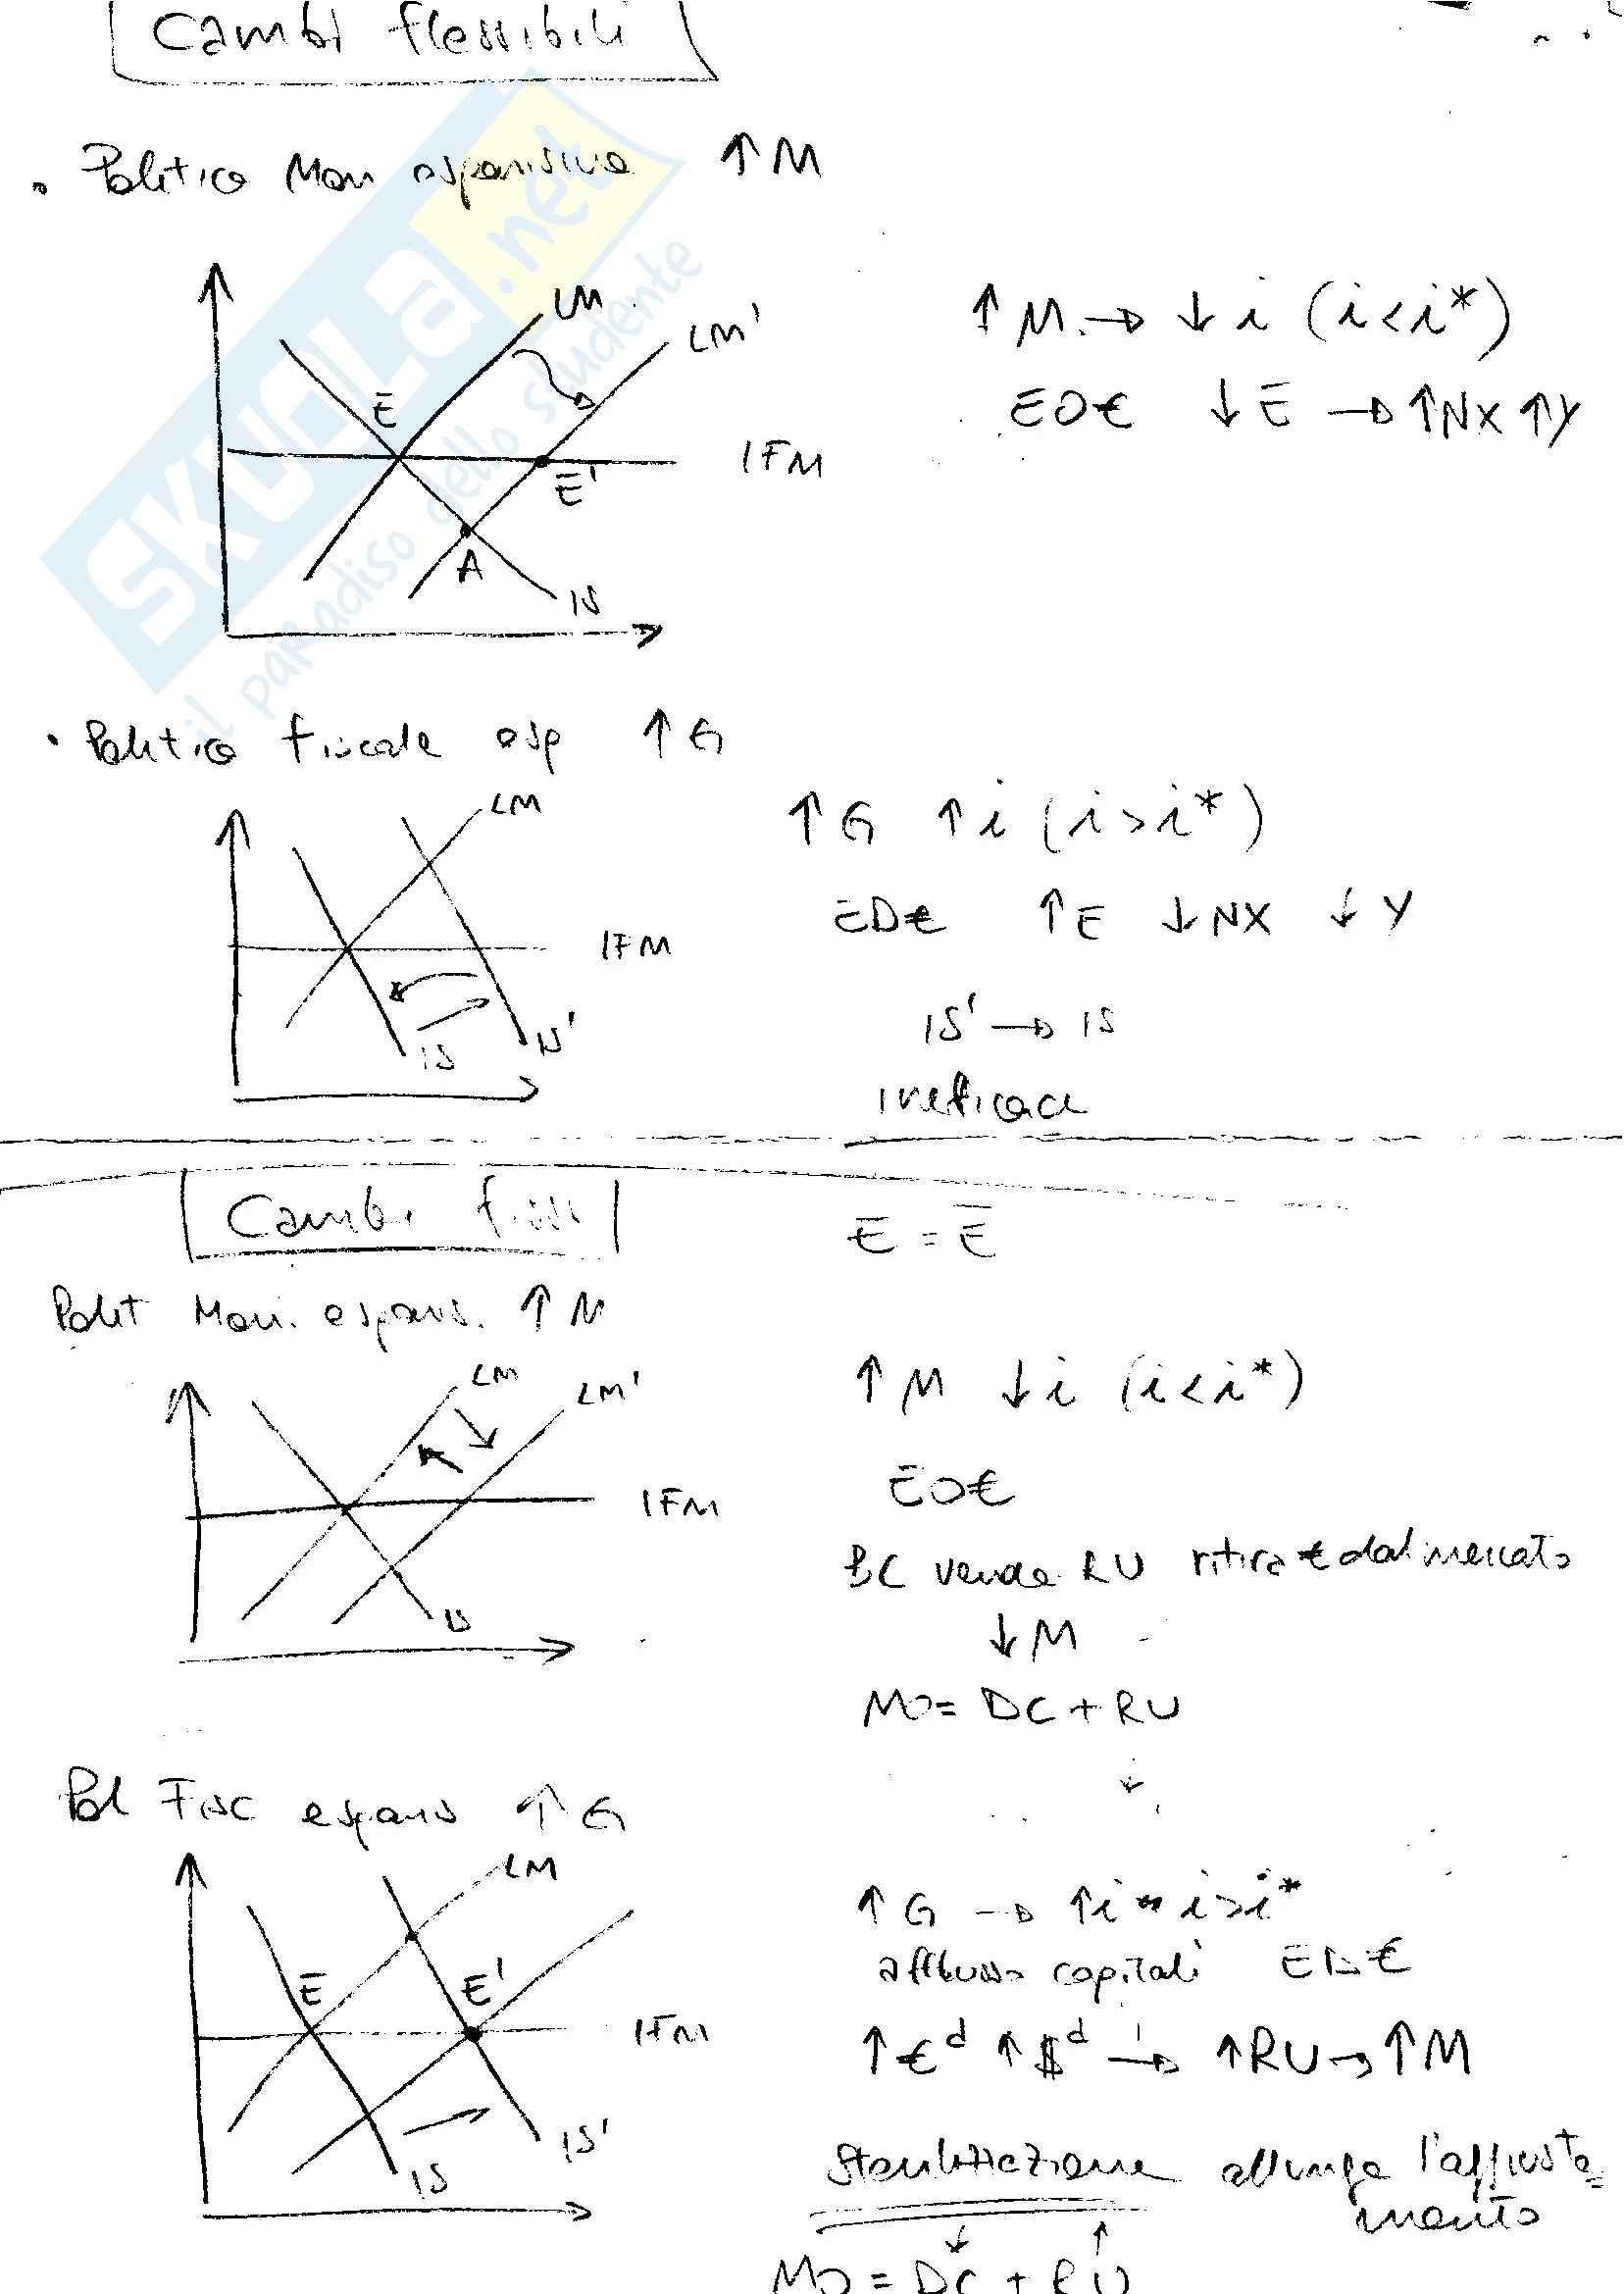 Lezioni, Macroeconomia Pag. 76